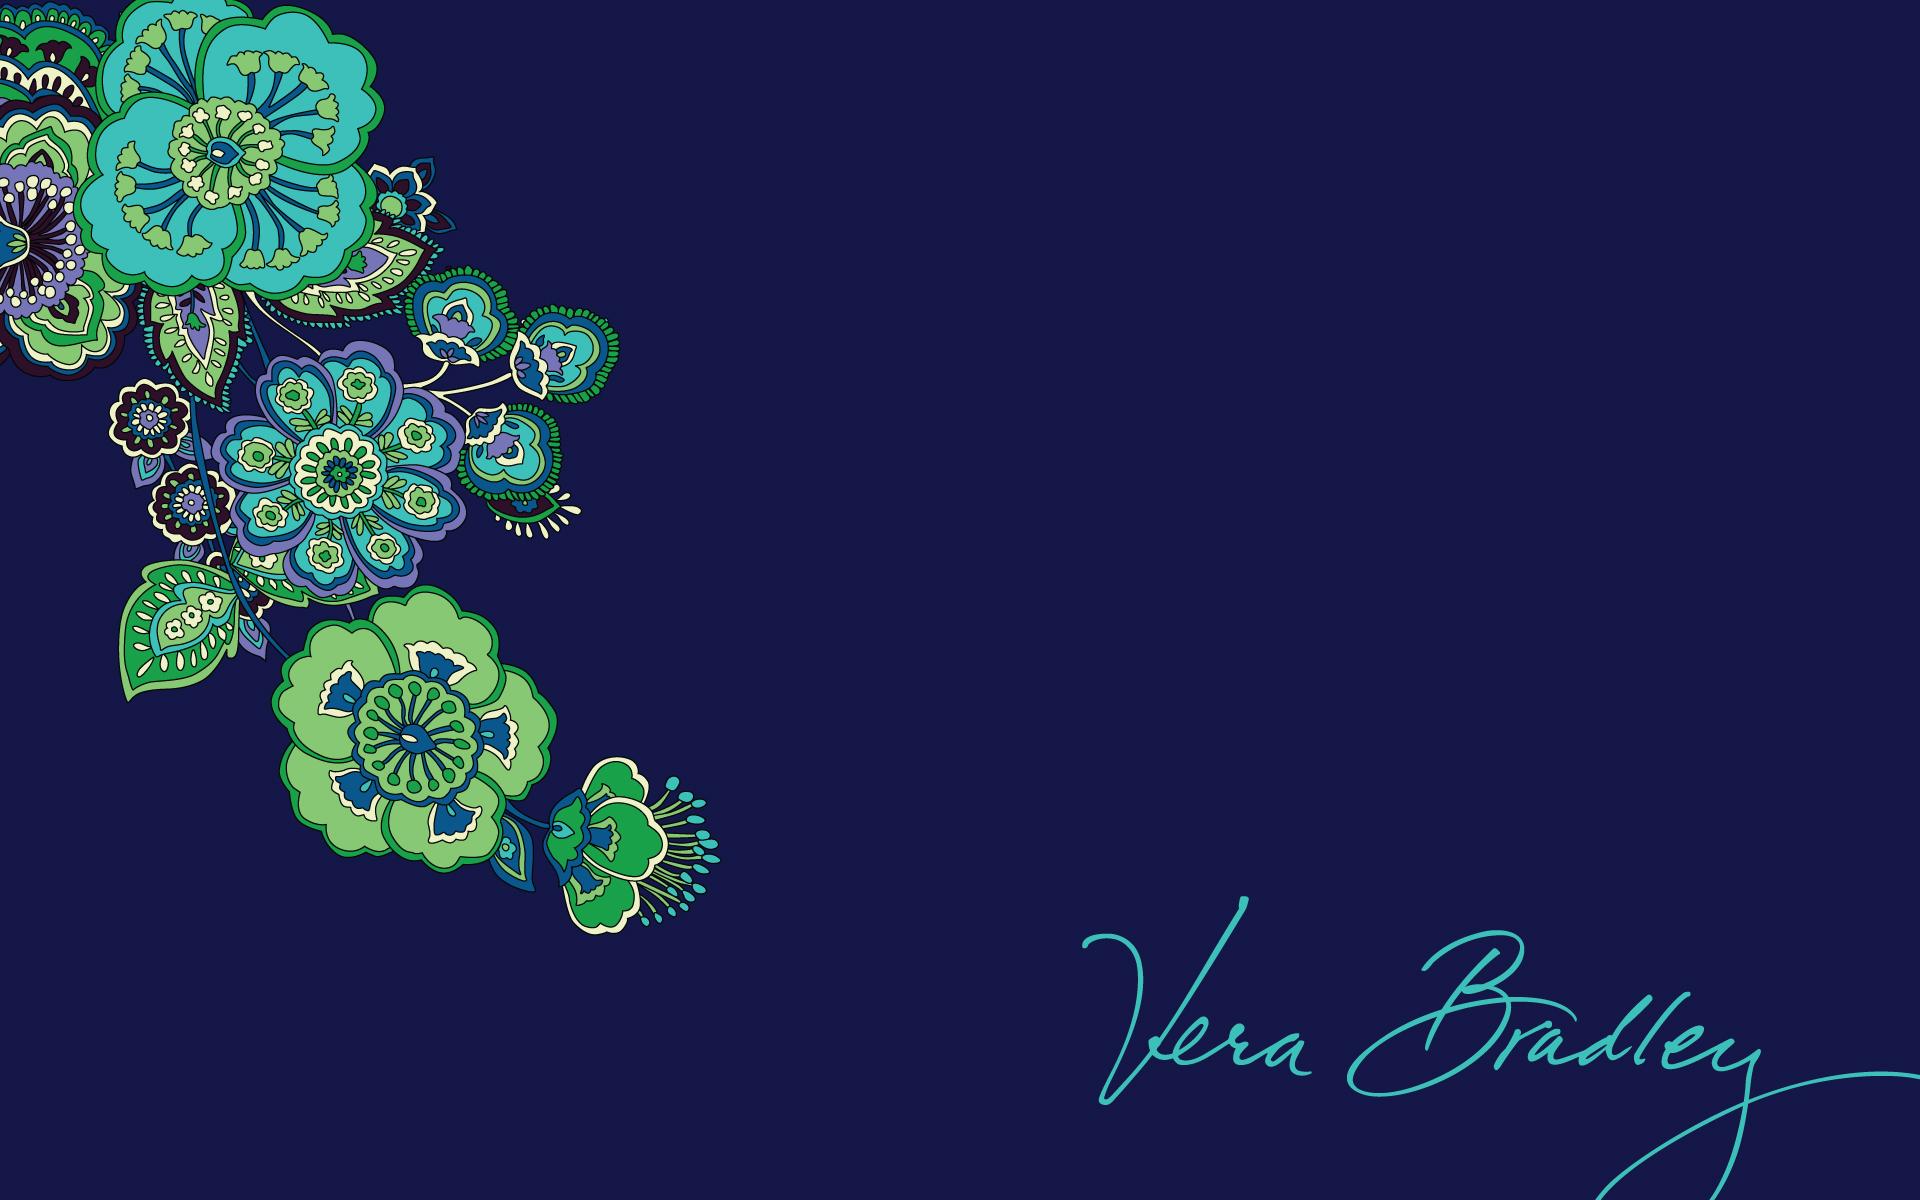 Vera Bradley images VB Wallpapers HD wallpaper and 1920x1200